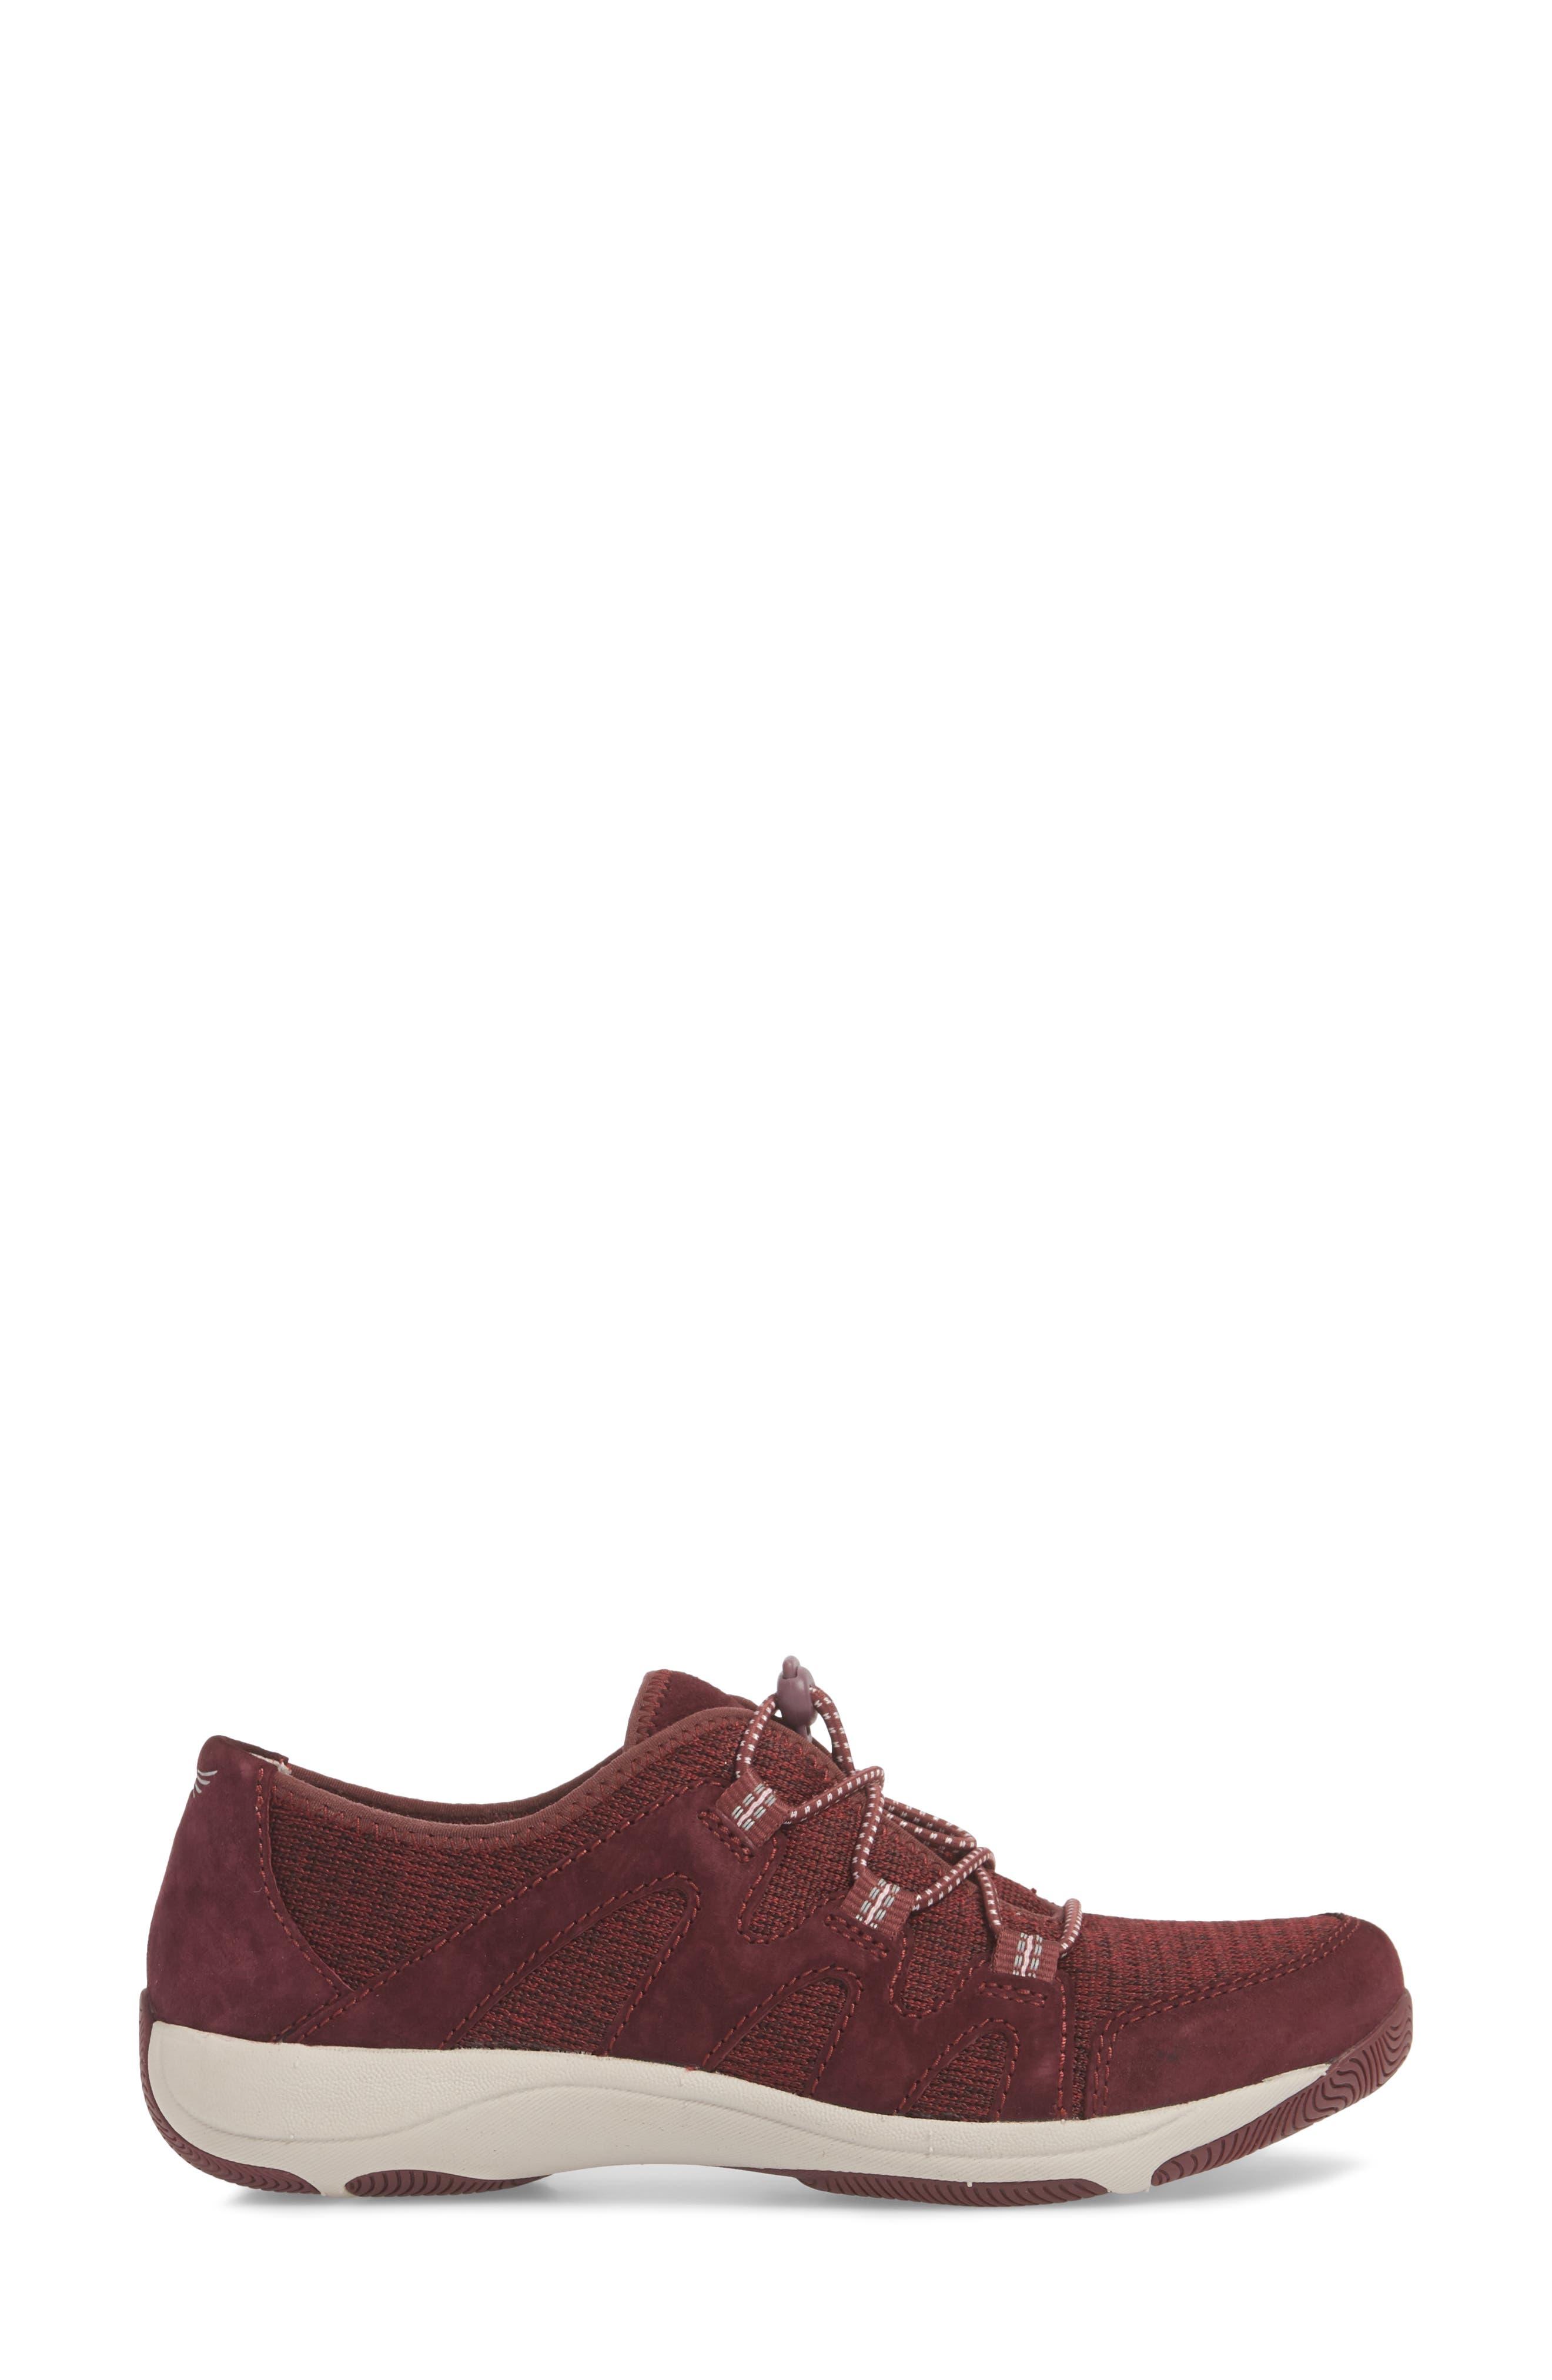 DANSKO, Holland Sneaker, Alternate thumbnail 3, color, WINE SUEDE